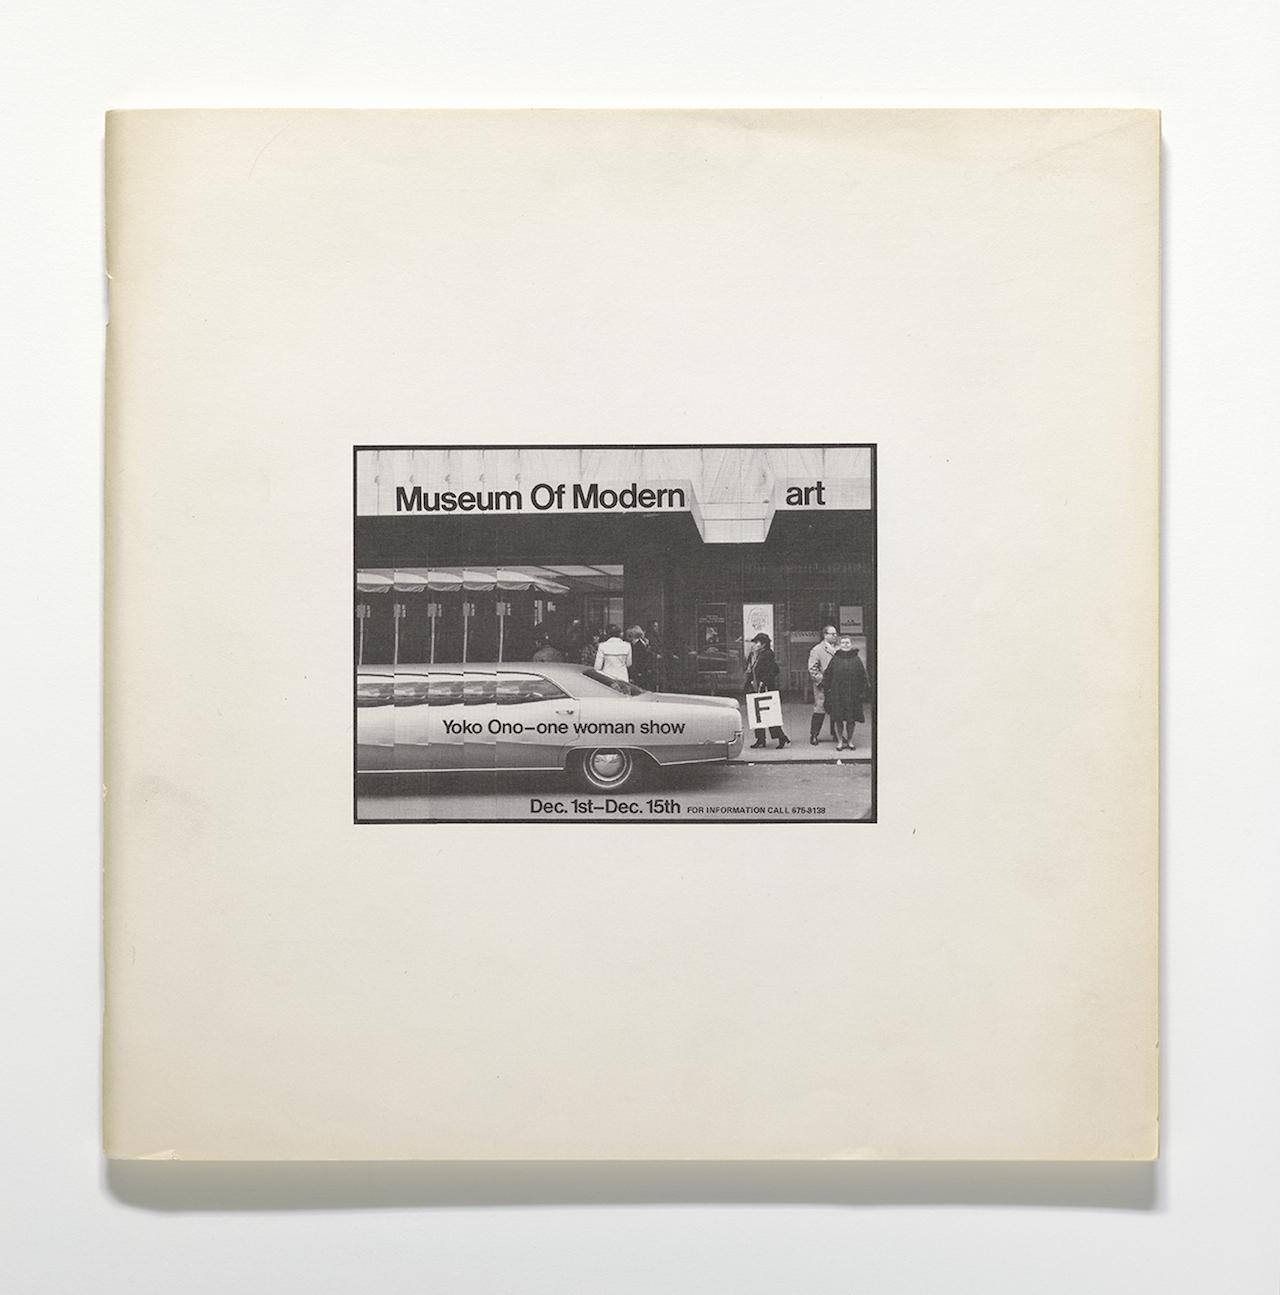 Yoko Ono (Japanese, born 1933) Museum of Modern [F]art. 1971. Exhibition catalogue, offset, 11 13/16 x 11 13/16 x 3/8″ (30 x 30 x 1 cm). The Museum of Modern Art Library, New York. © Yoko Ono 2014